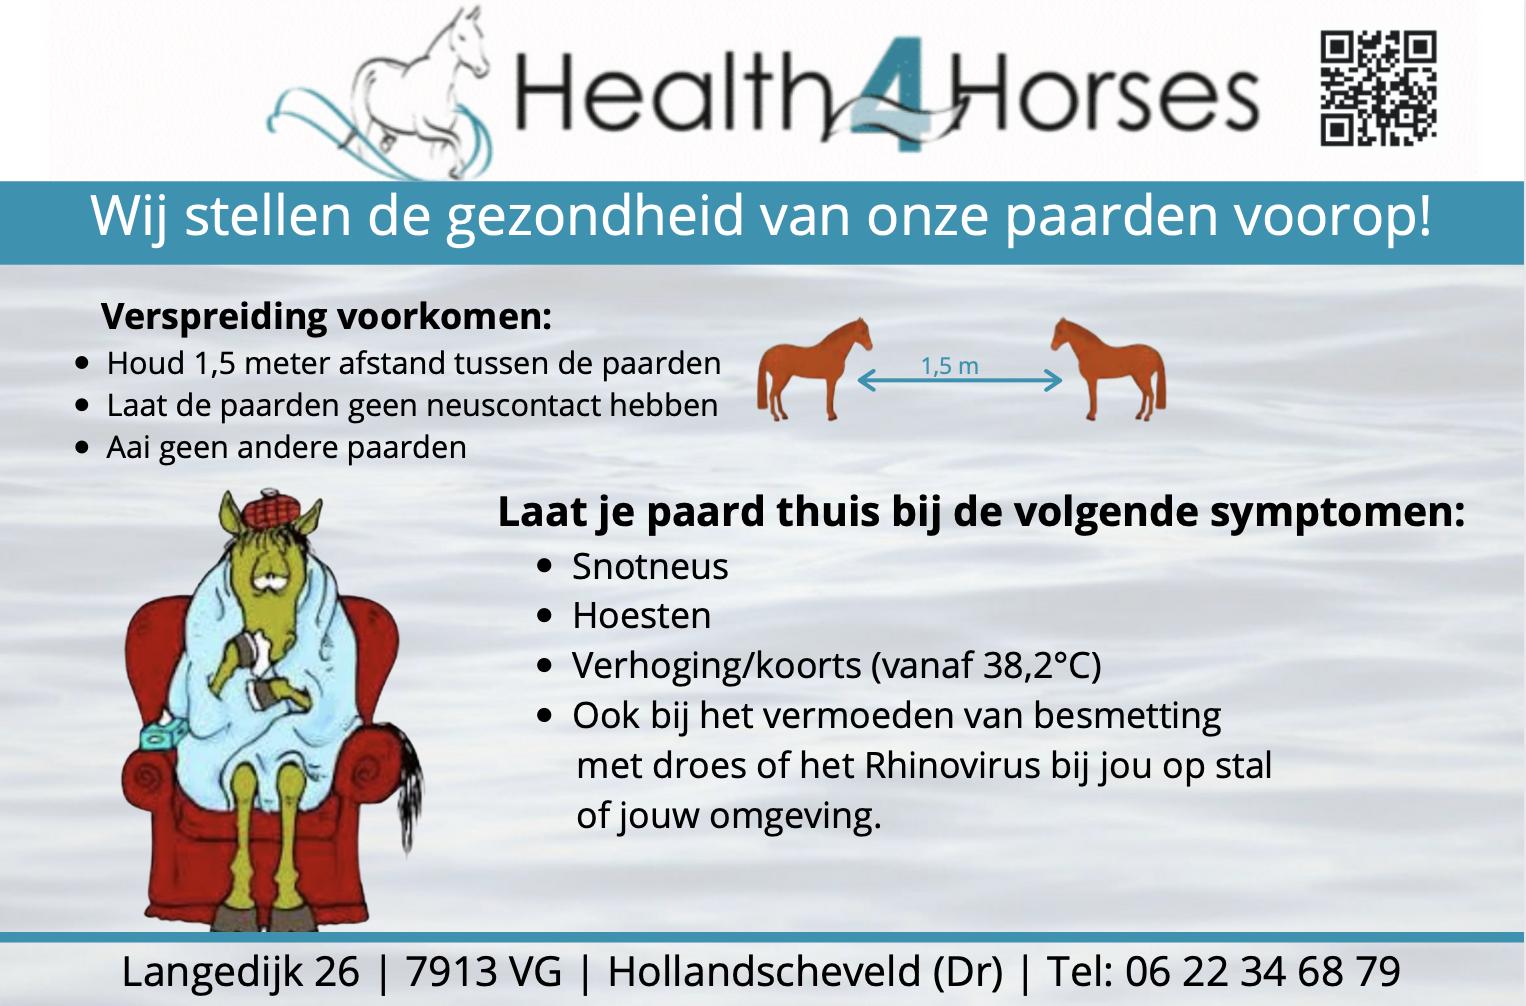 Healt4Horses